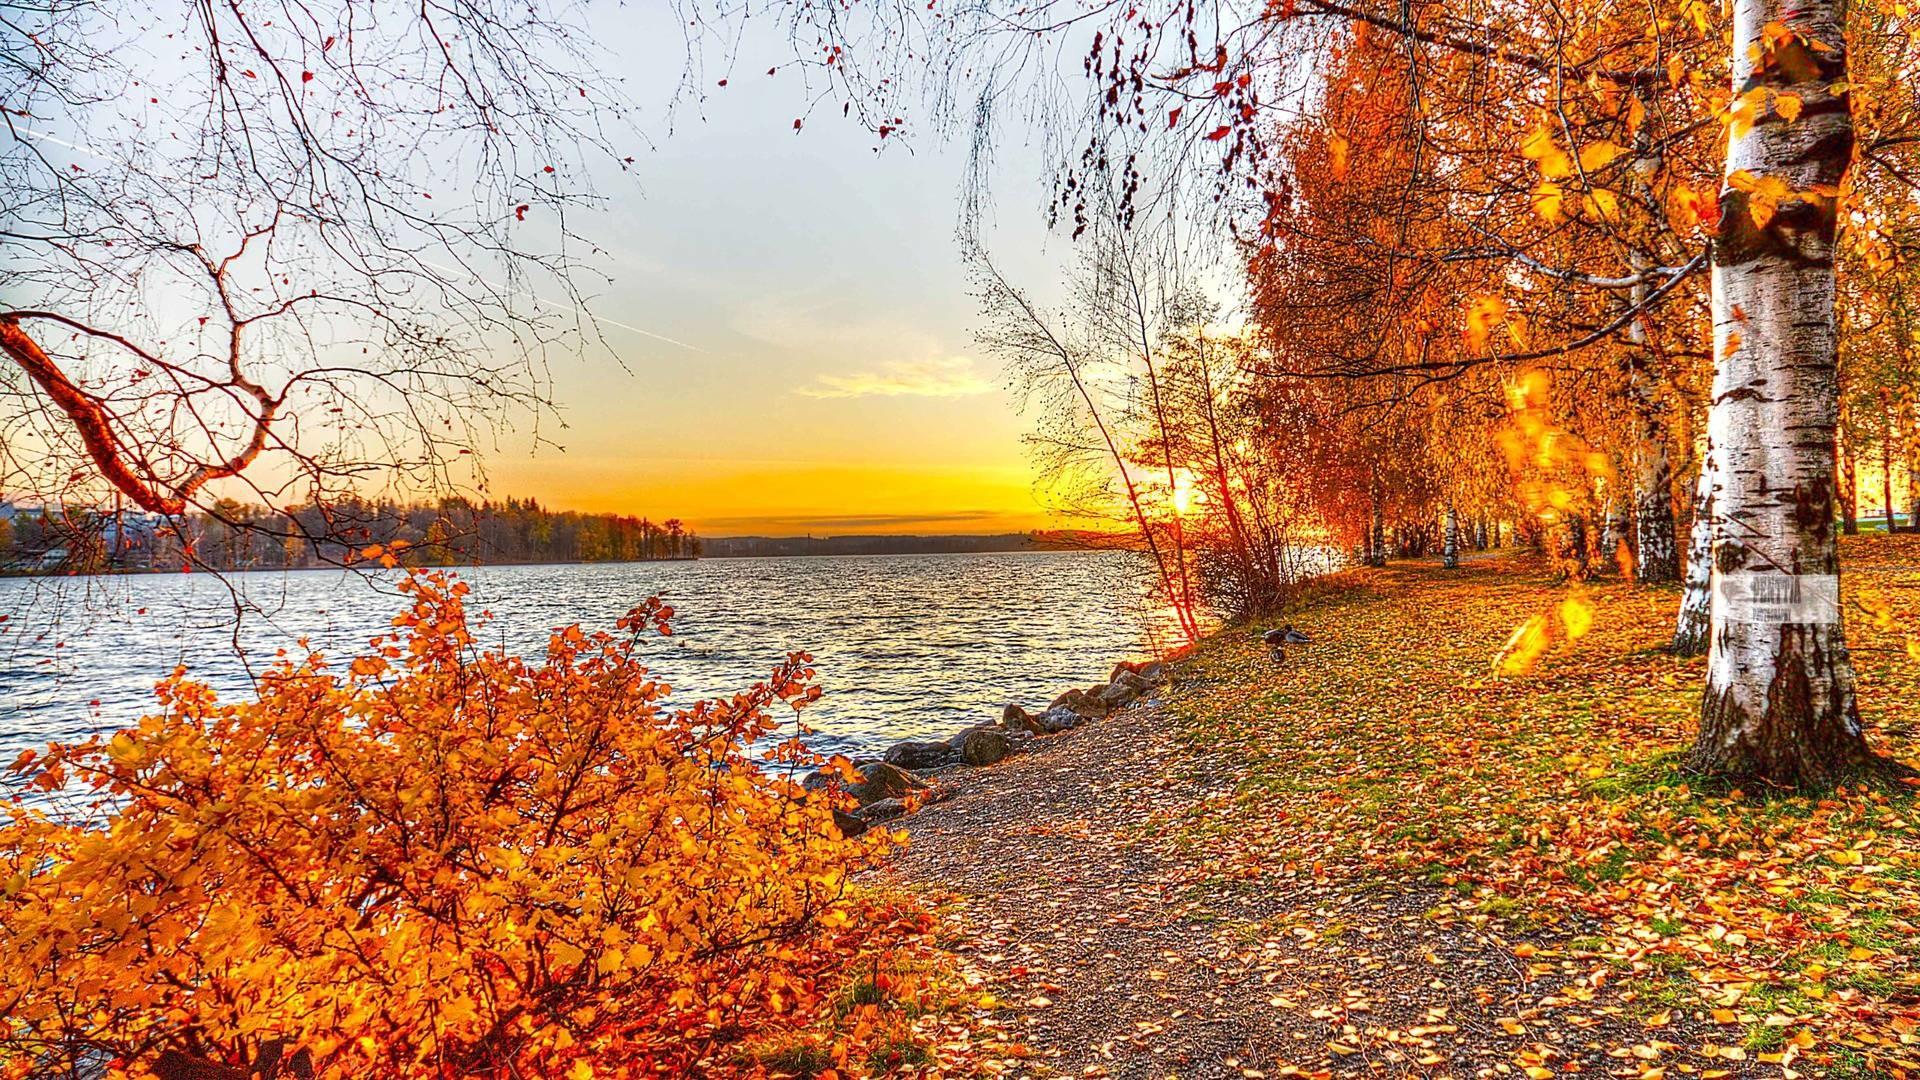 Beautiful Autumn Landscape Free Wallpaper #6747 Wallpaper computer .